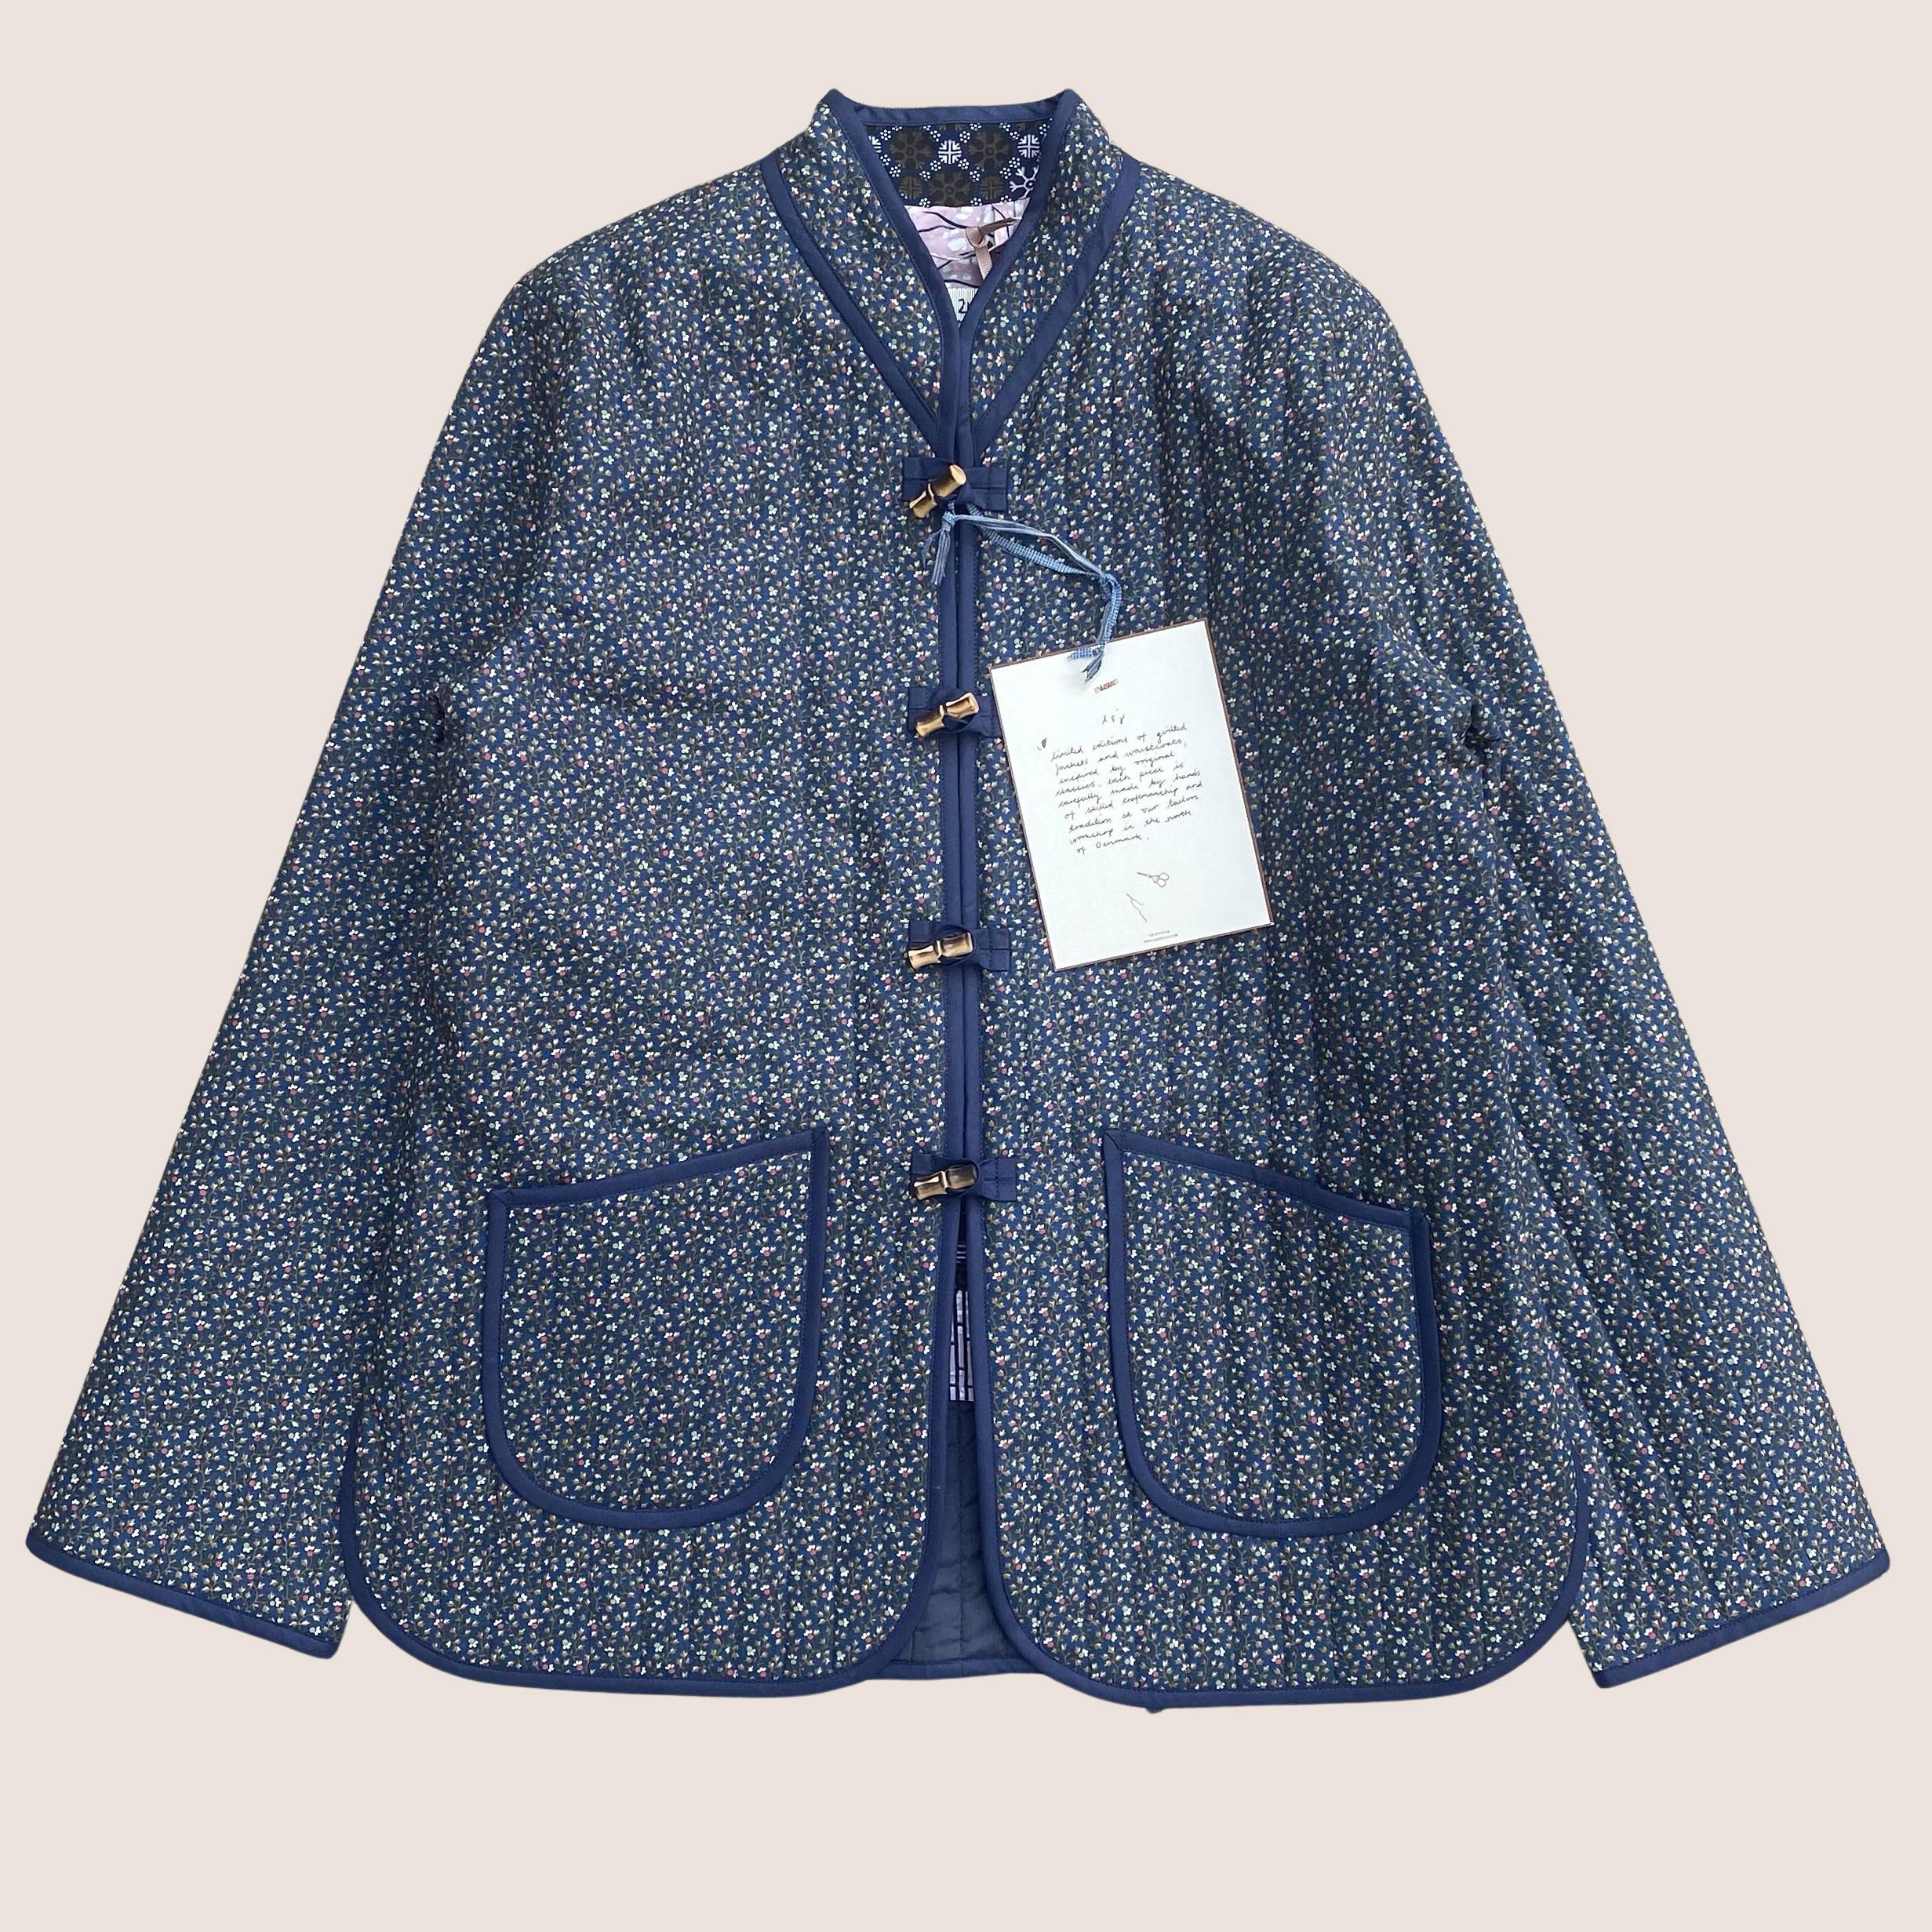 The Original Quilt Jacket - Petrol